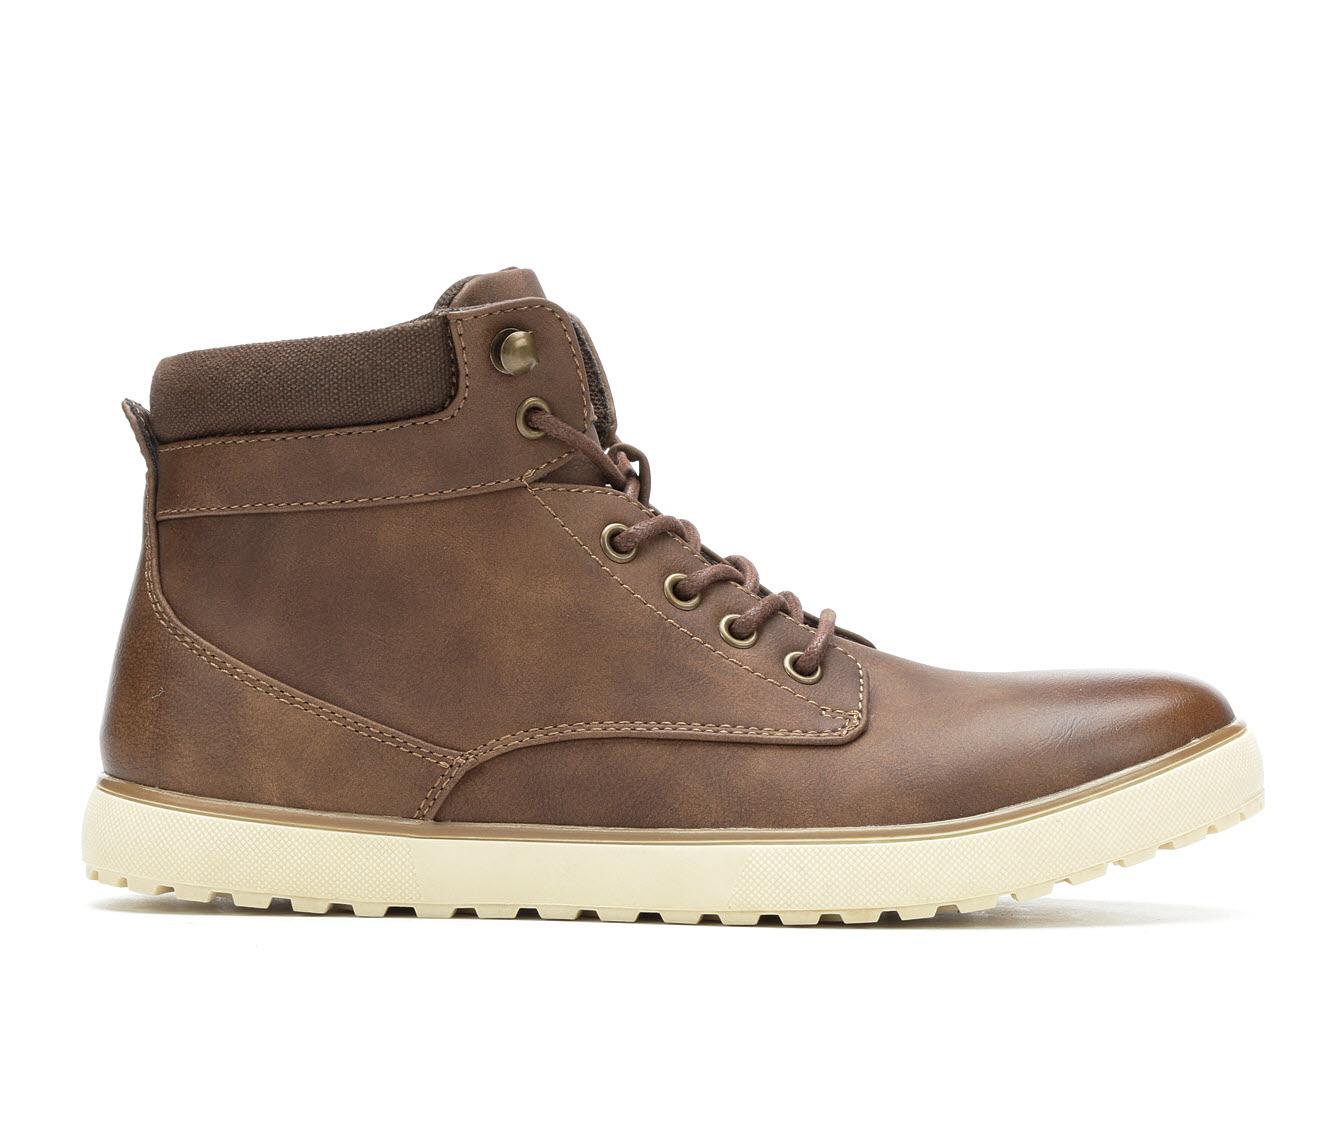 Gotcha Curran Men's Boots (Brown Faux Leather)